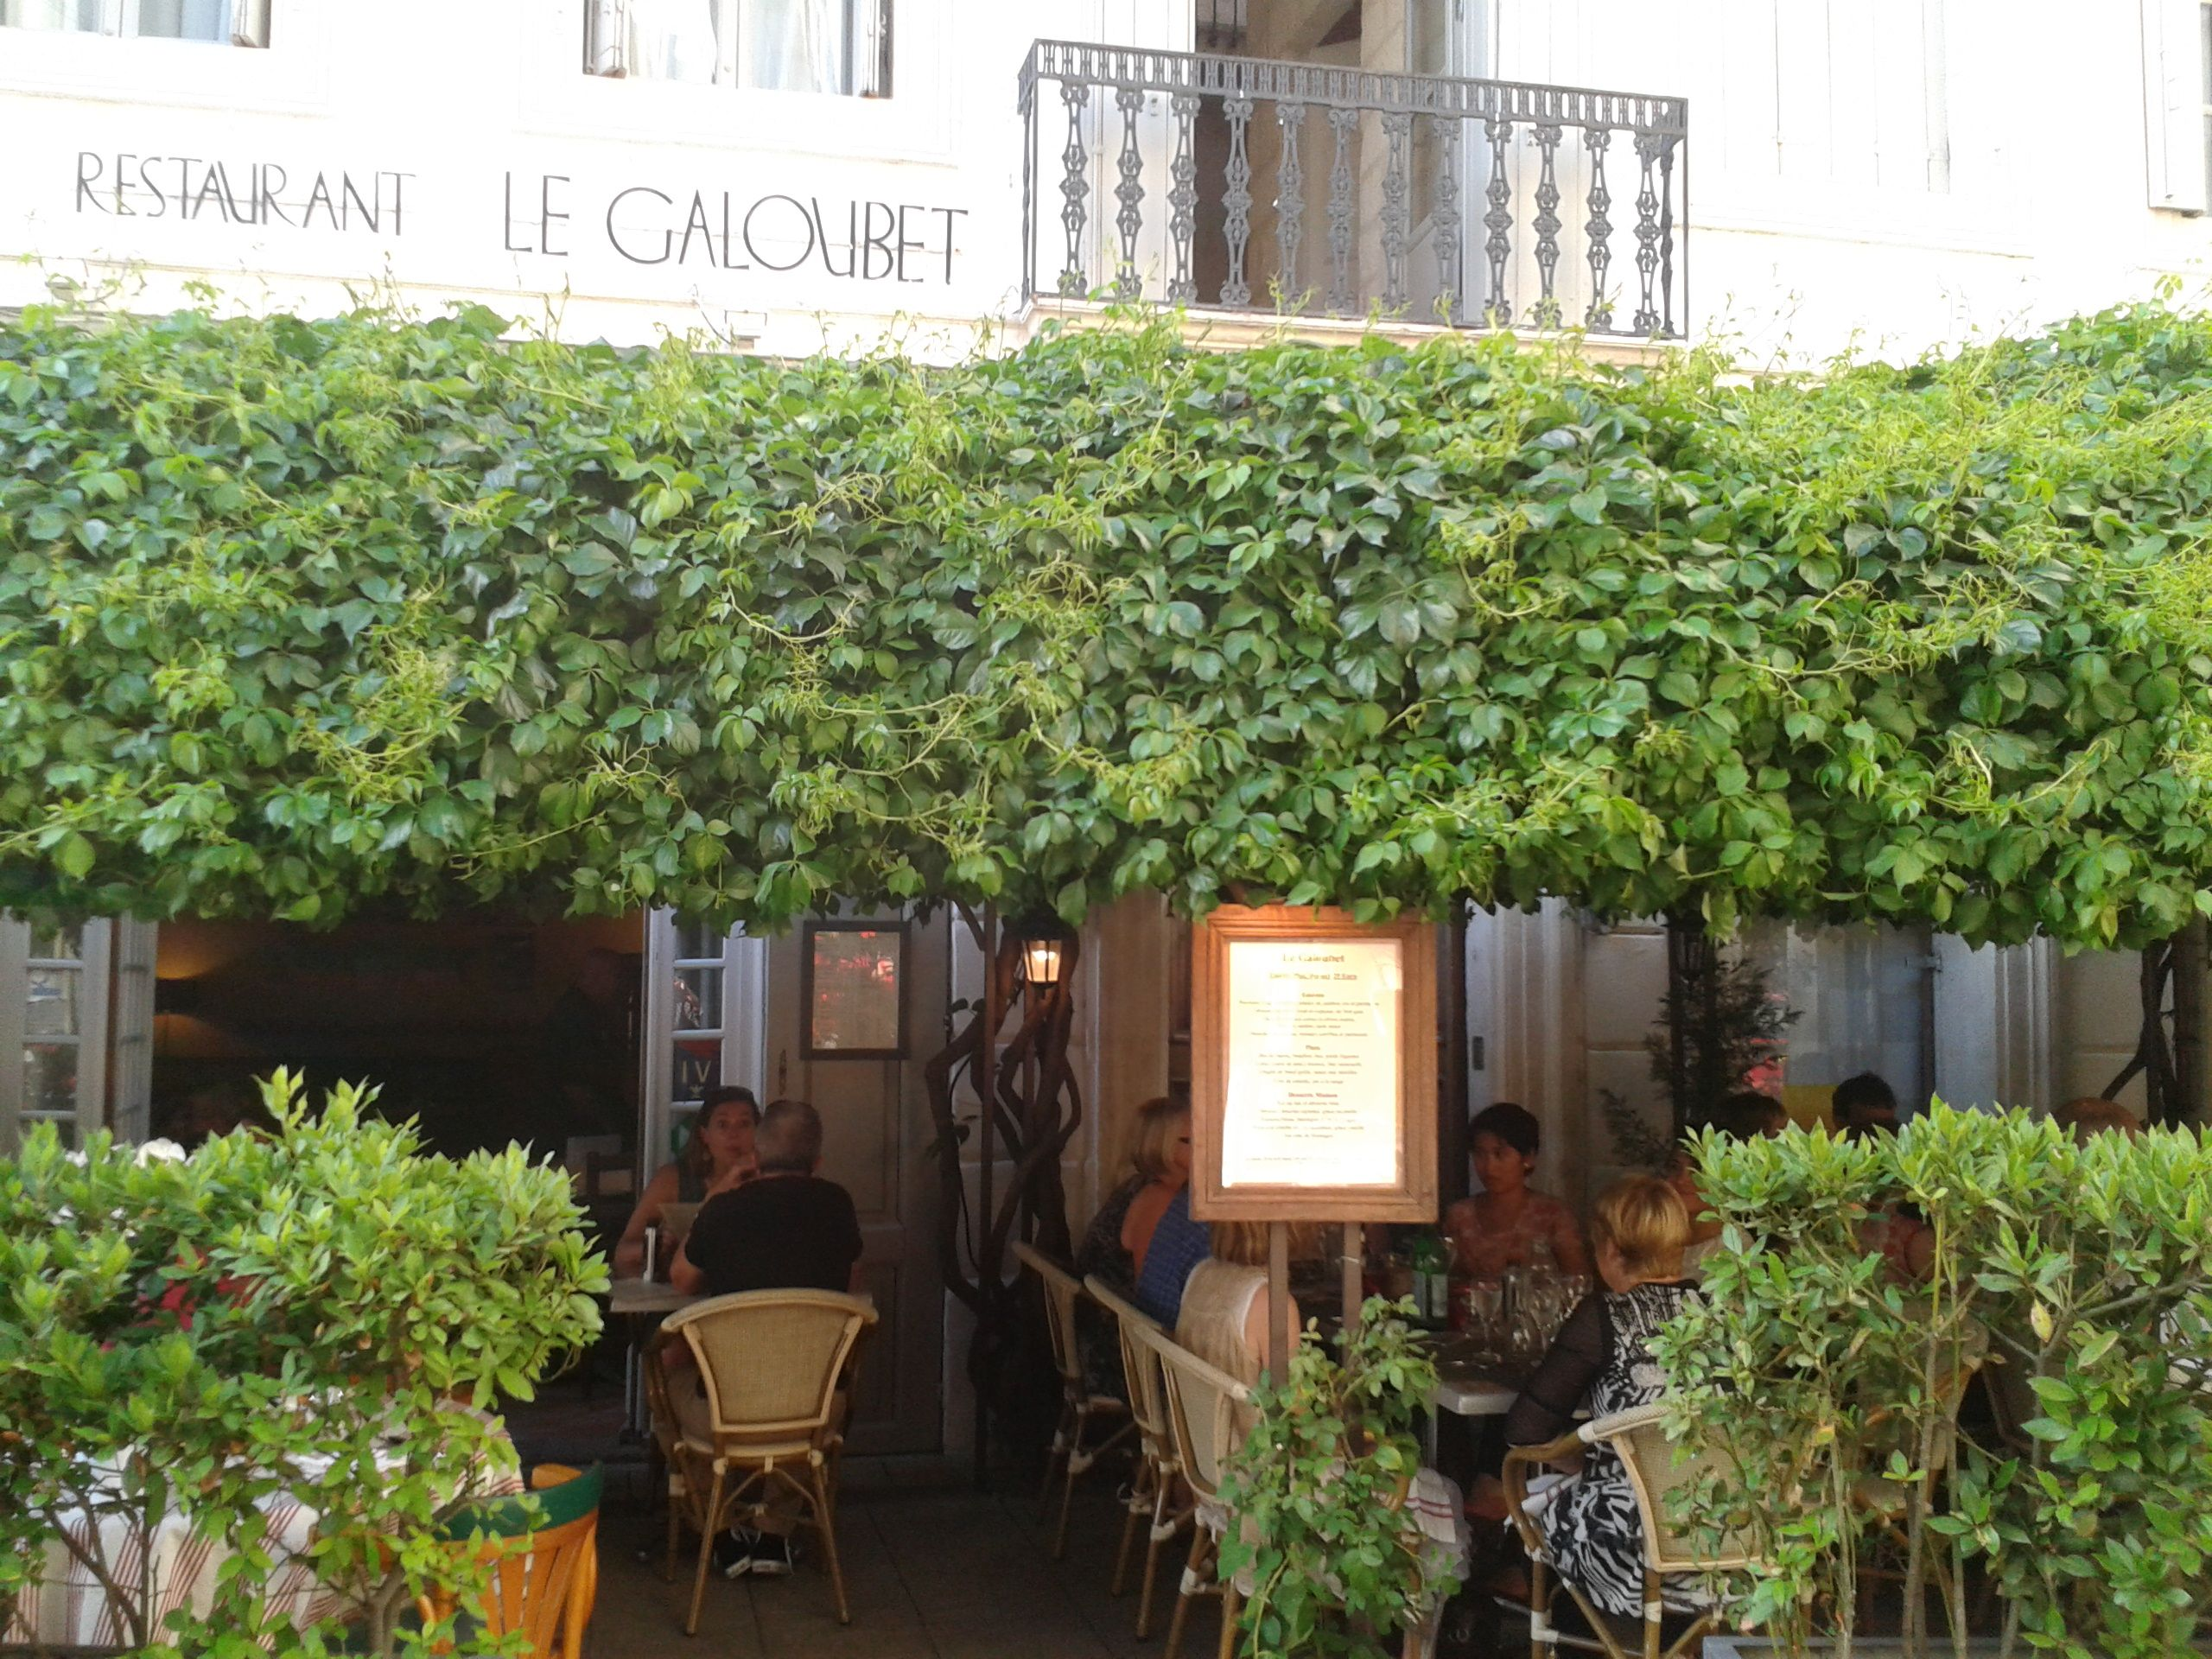 Le Galoubet Arles France Arles Restaurant France